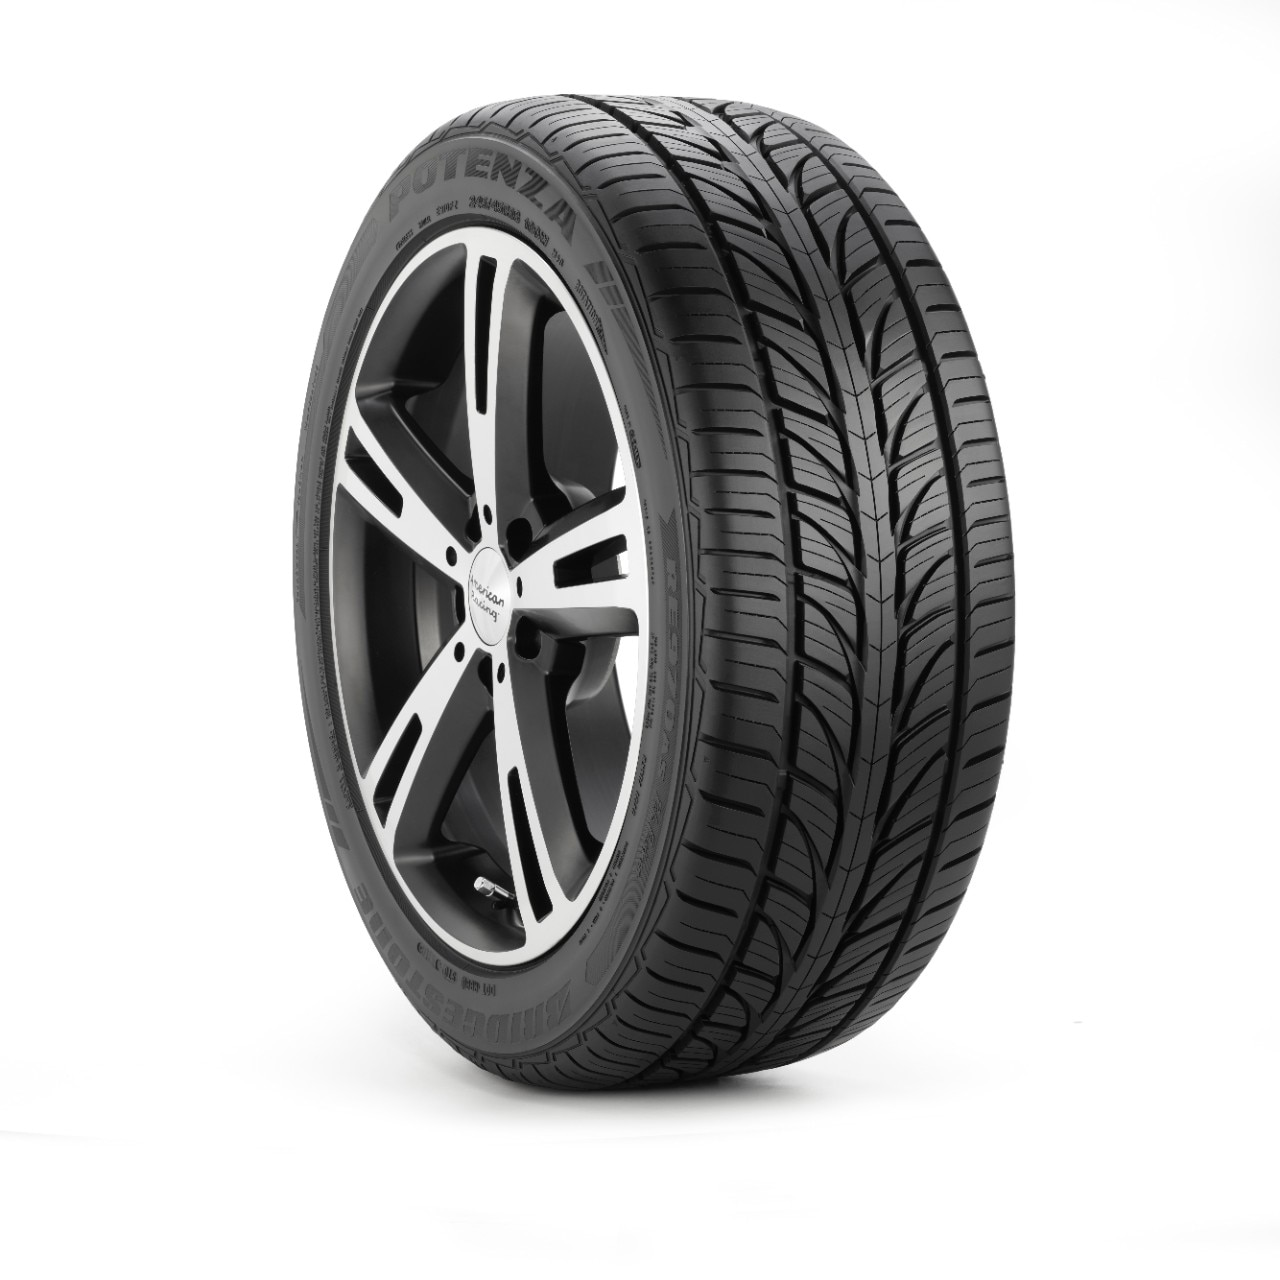 bridgestone potenza re970as pole position tire traction on wet dry roads bridgestone tires. Black Bedroom Furniture Sets. Home Design Ideas